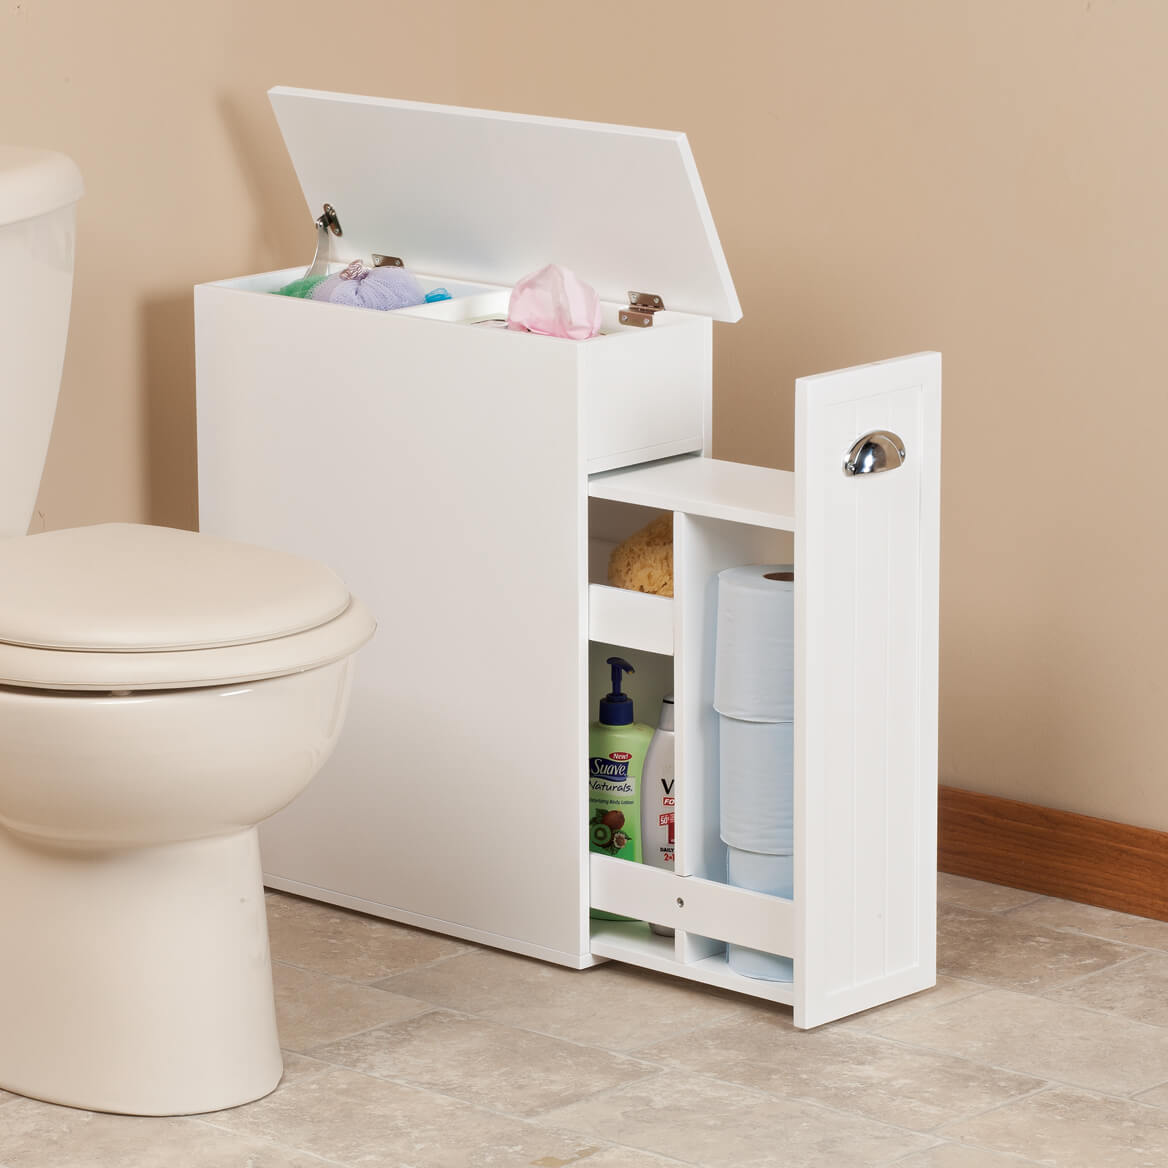 slim bathroom storage cabinet Slim Bathroom Storage Cabiby OakRidge   Slim Cabi  Walter  slim bathroom storage cabinet